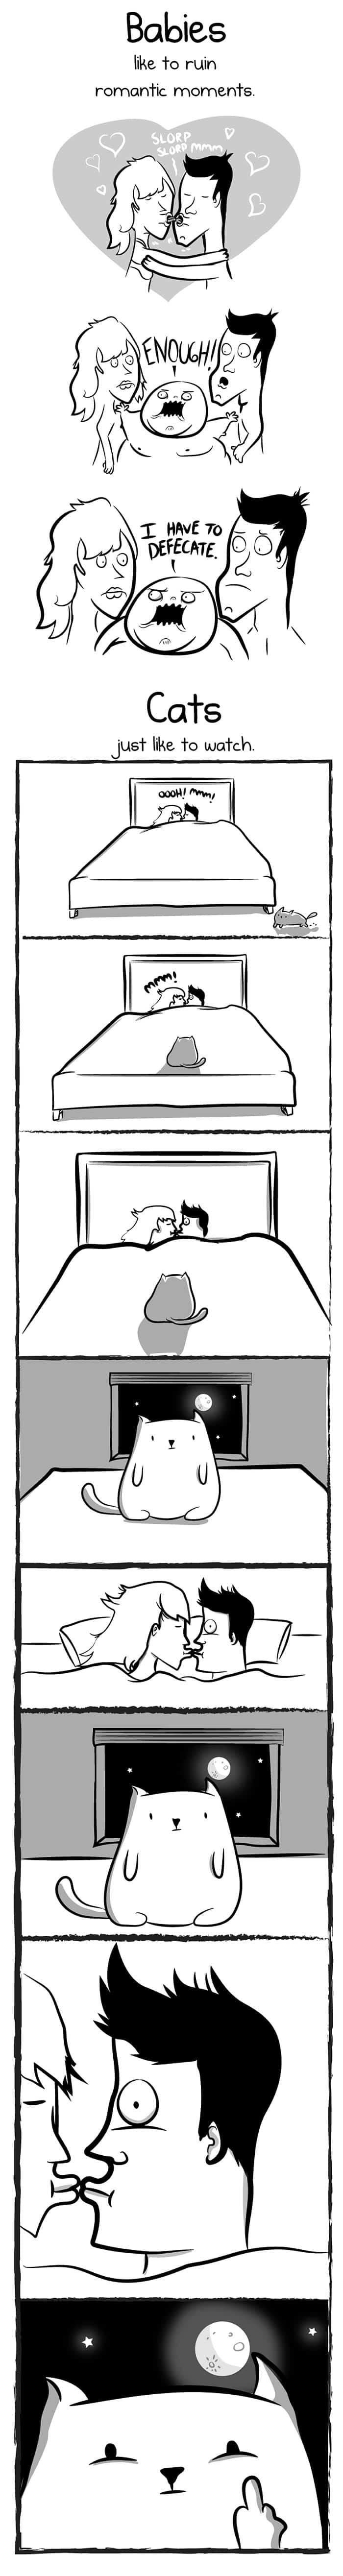 babies cats romance ruin